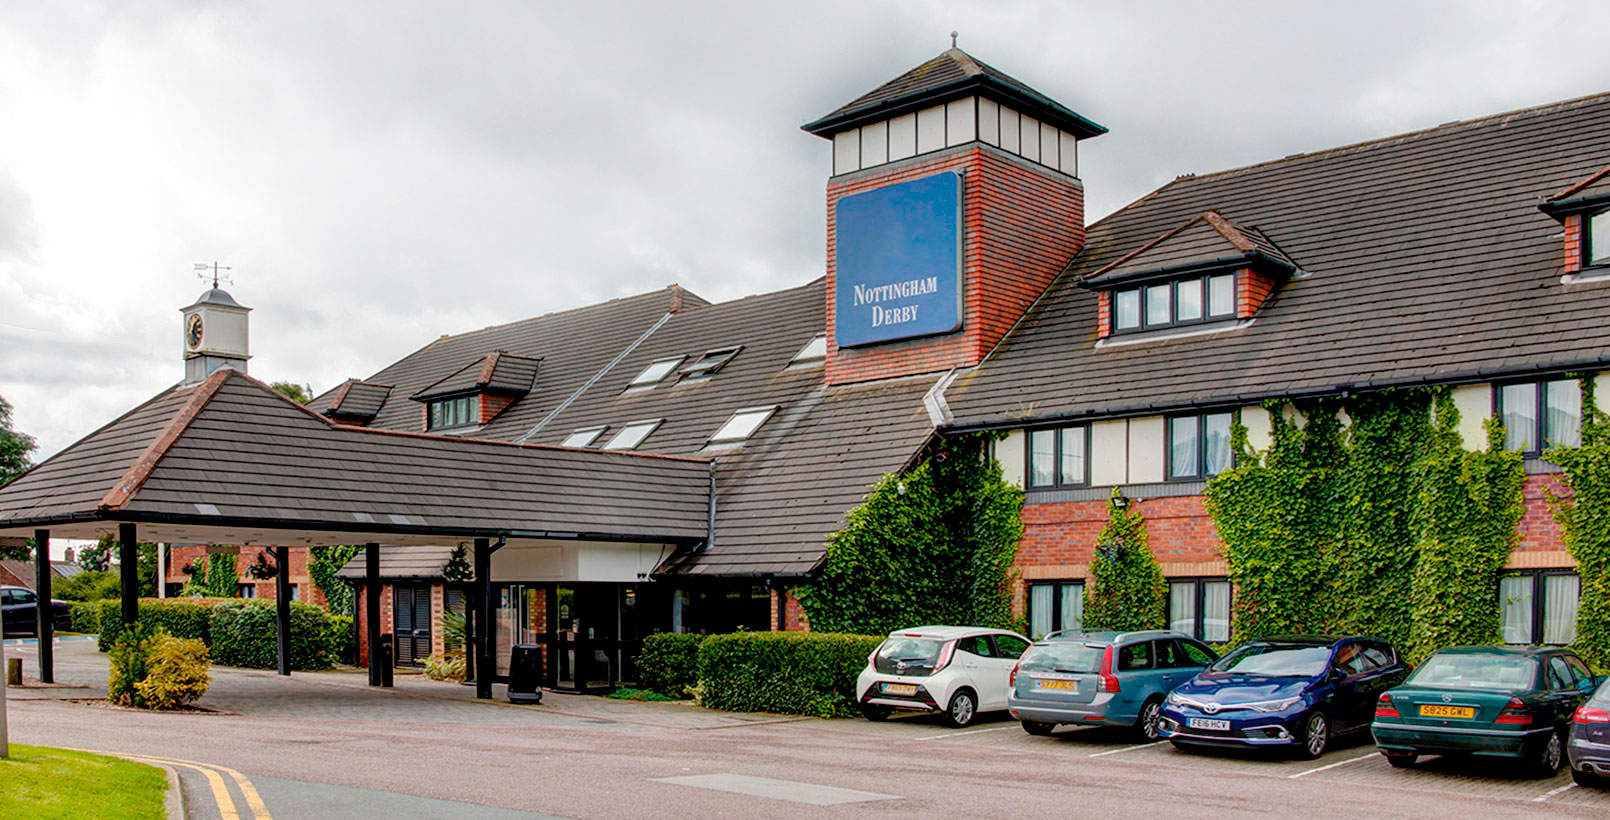 Derby Hotels Of Best Western Nottingham Derby